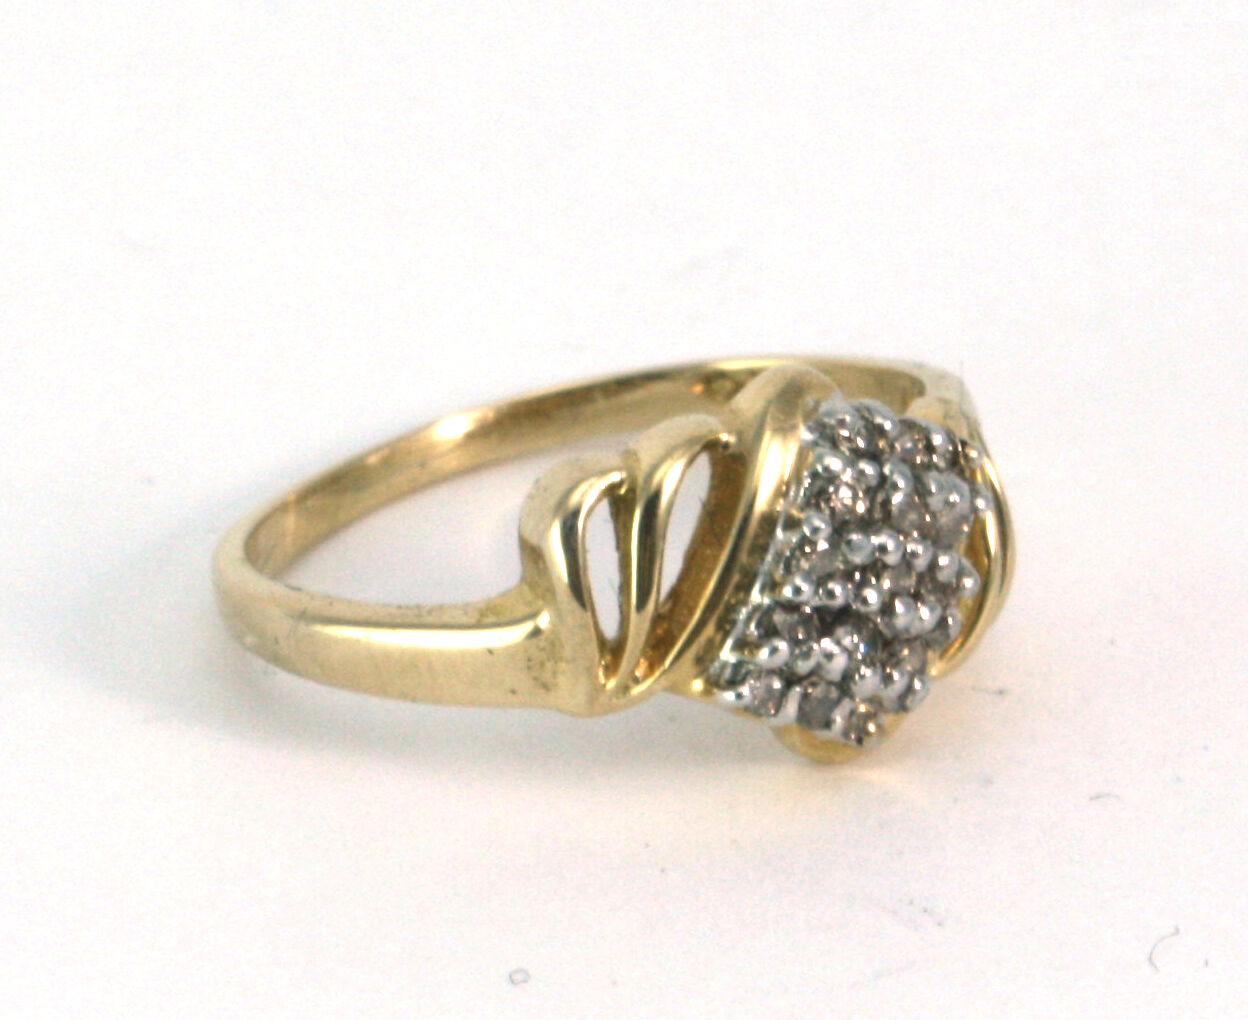 14K Yellow gold Cluster Diamond Ring for women 2.5 g, ring size 6